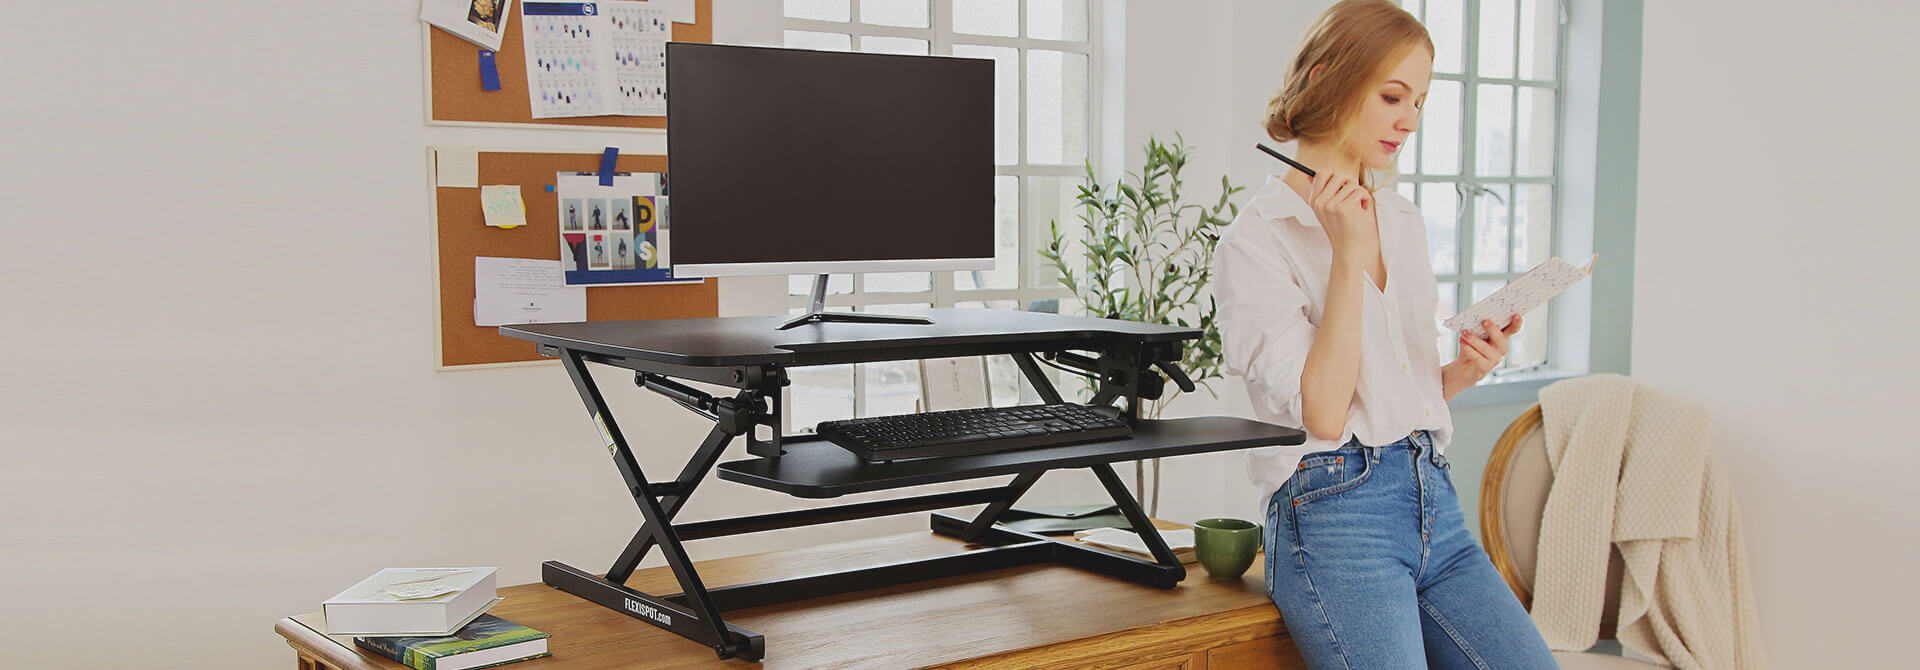 FLEXISPOT desk